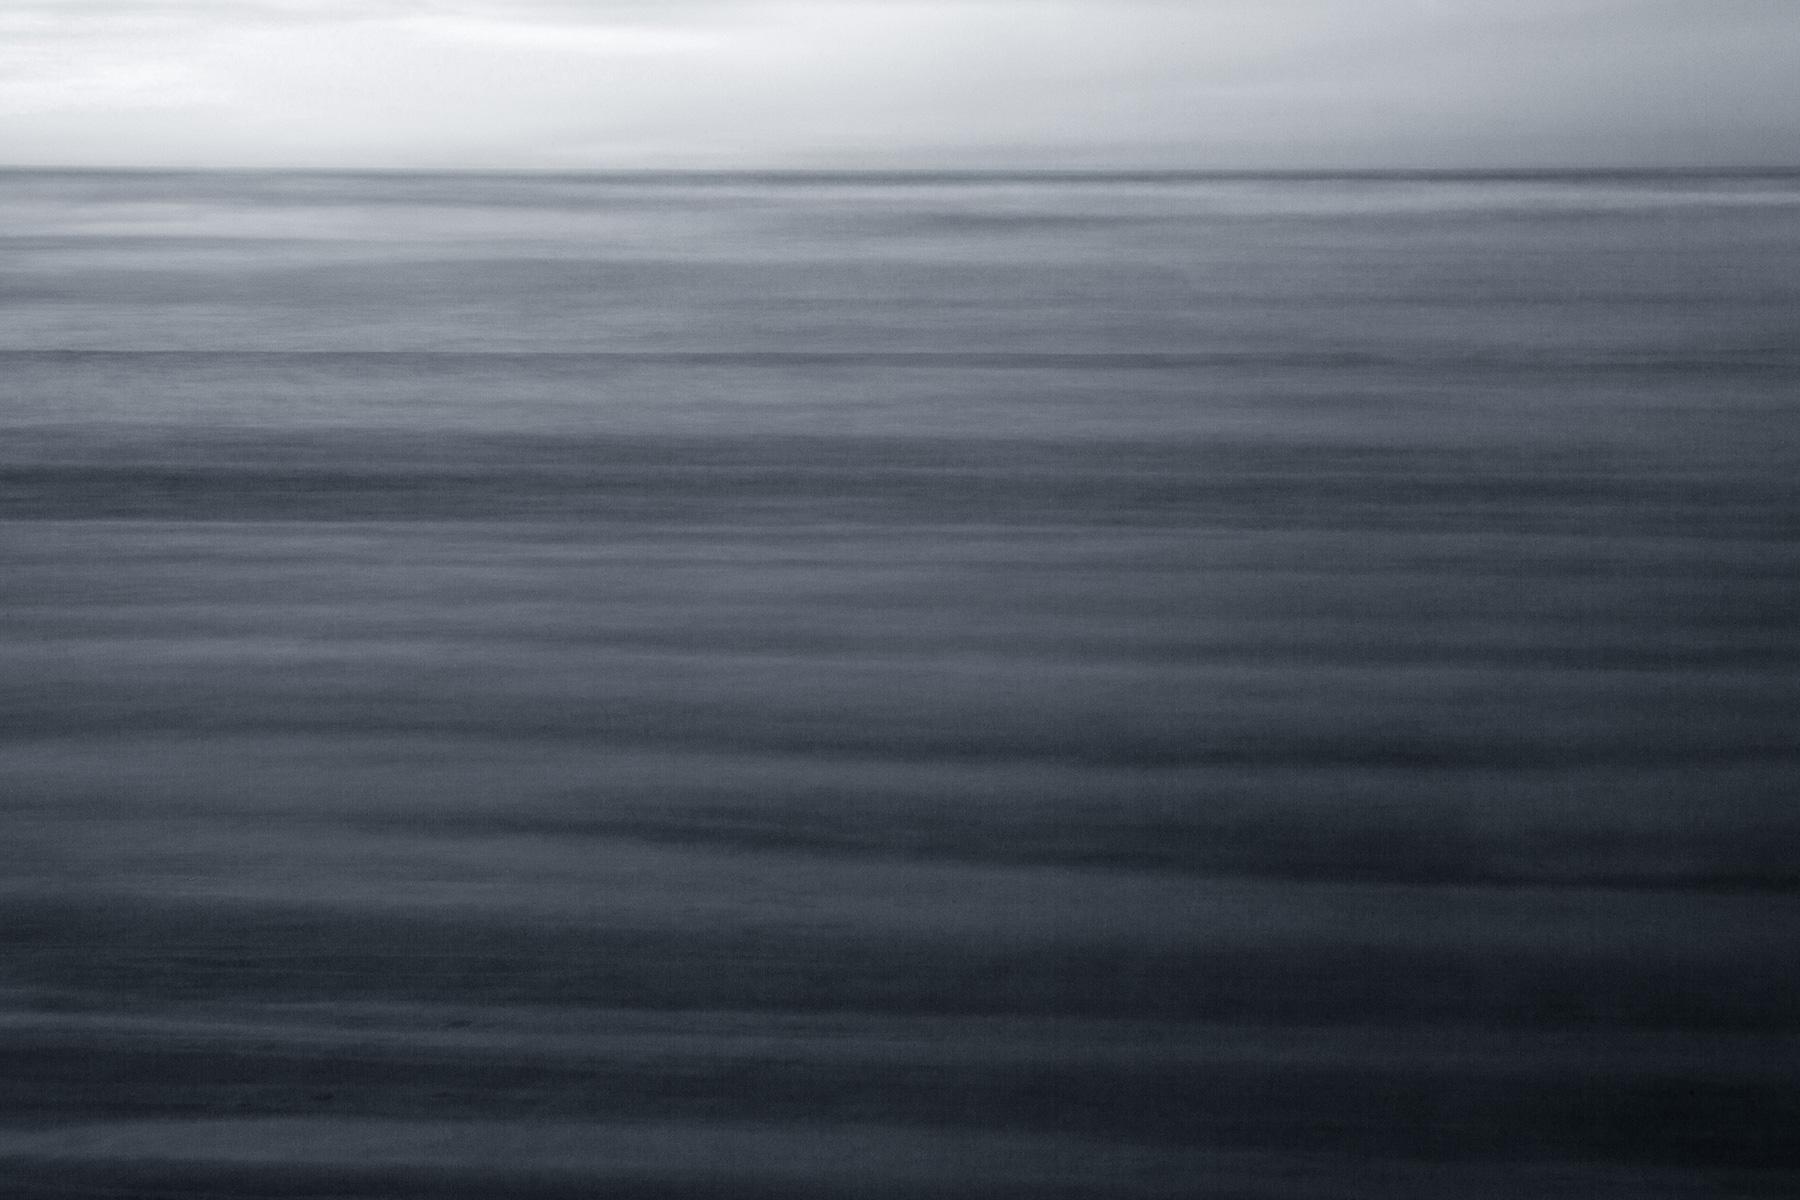 031-Seascape-10-120x90-cm-.jpg